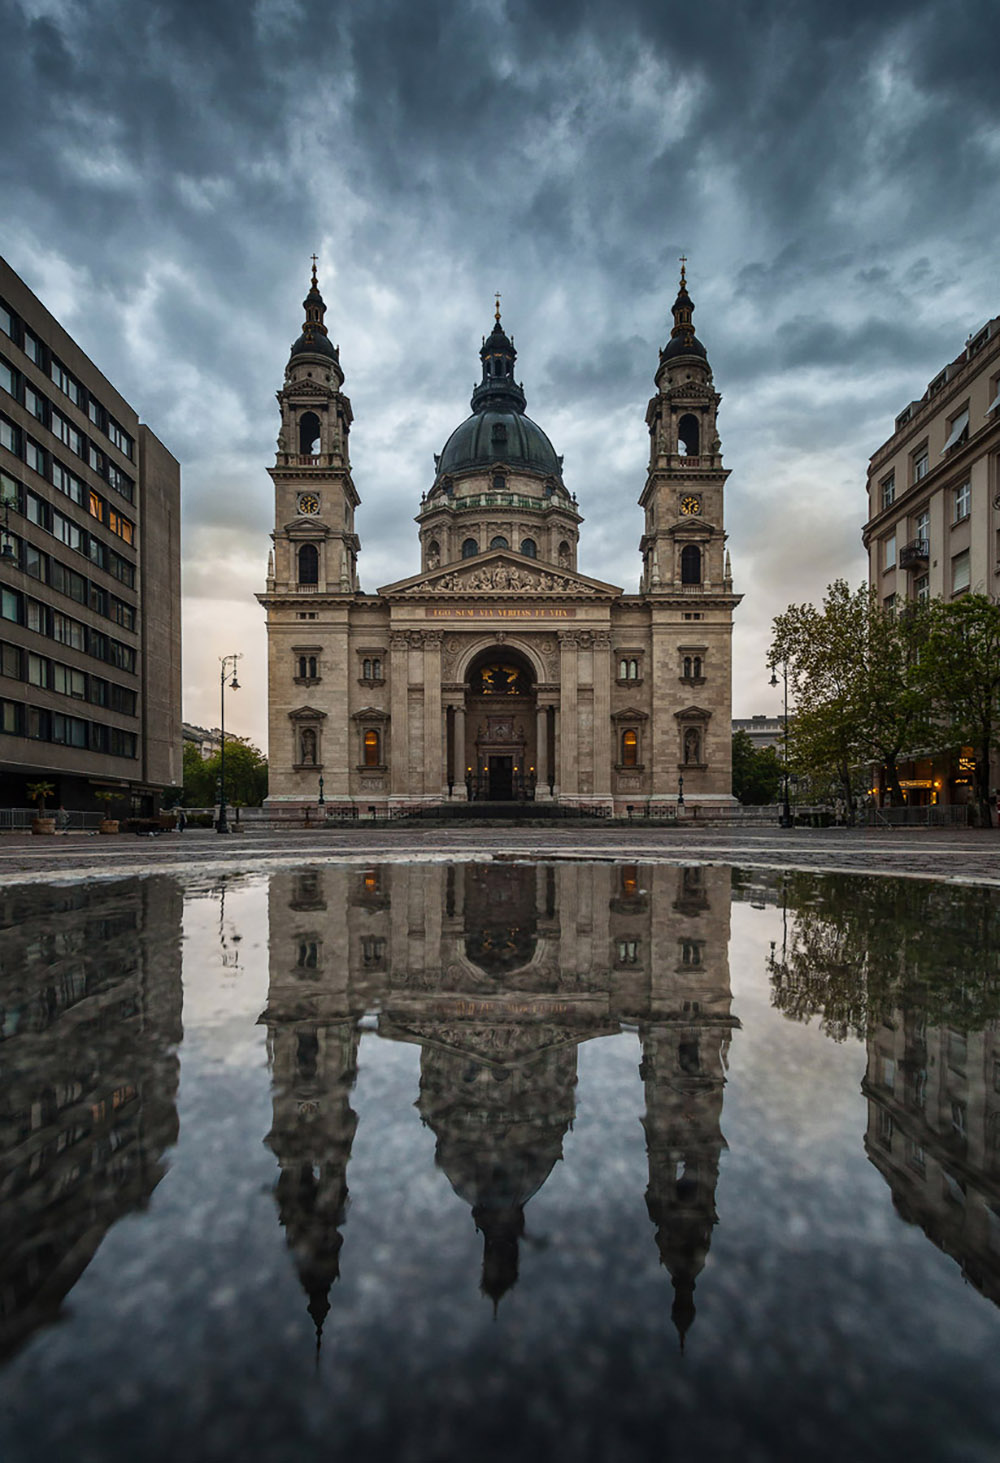 St.-stephen's-basilica-after-a-rainy-night